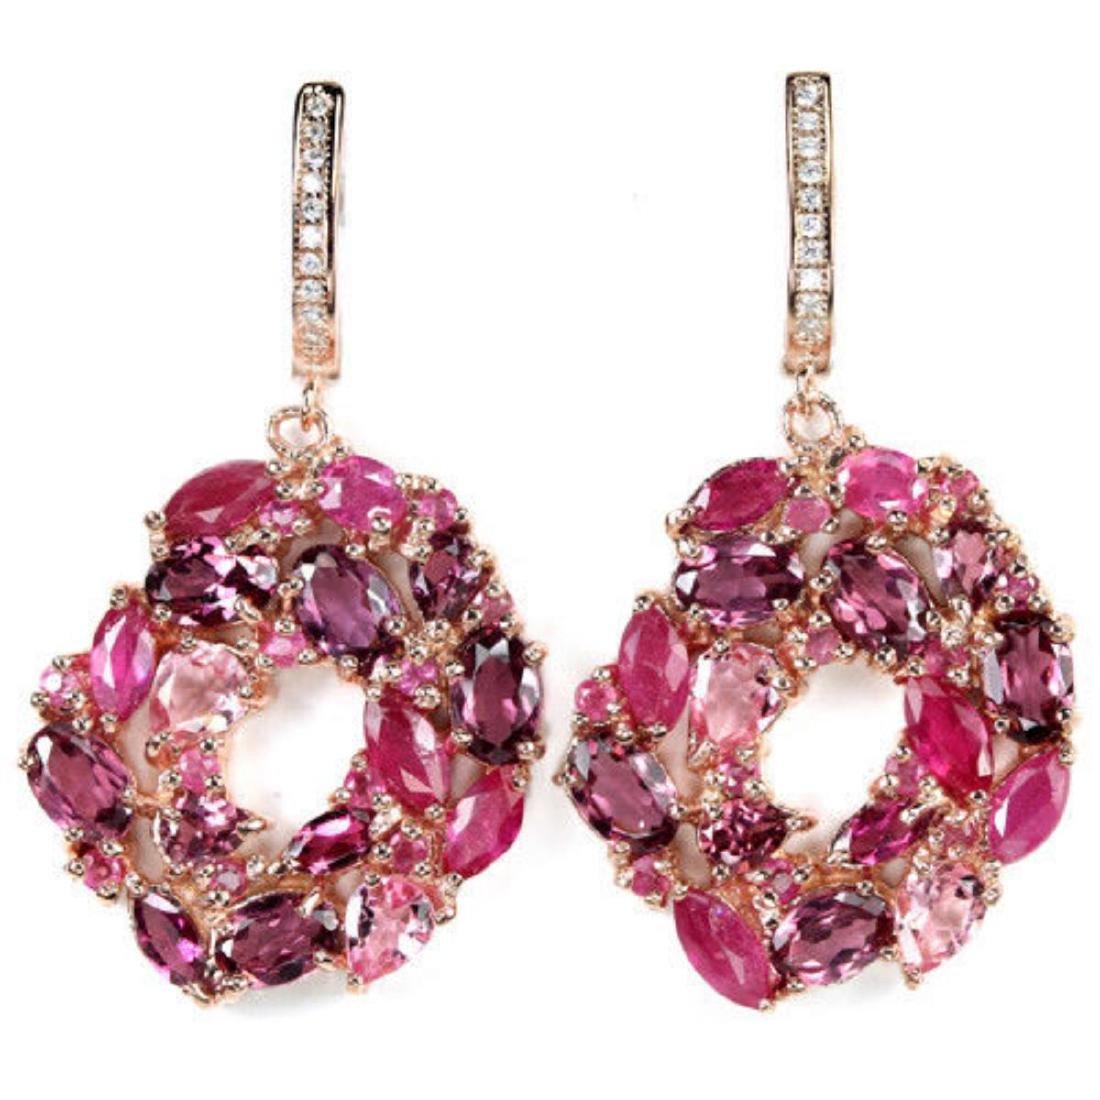 Natural RHODOLITE GARNET RUBY TOURMALINE Earrings